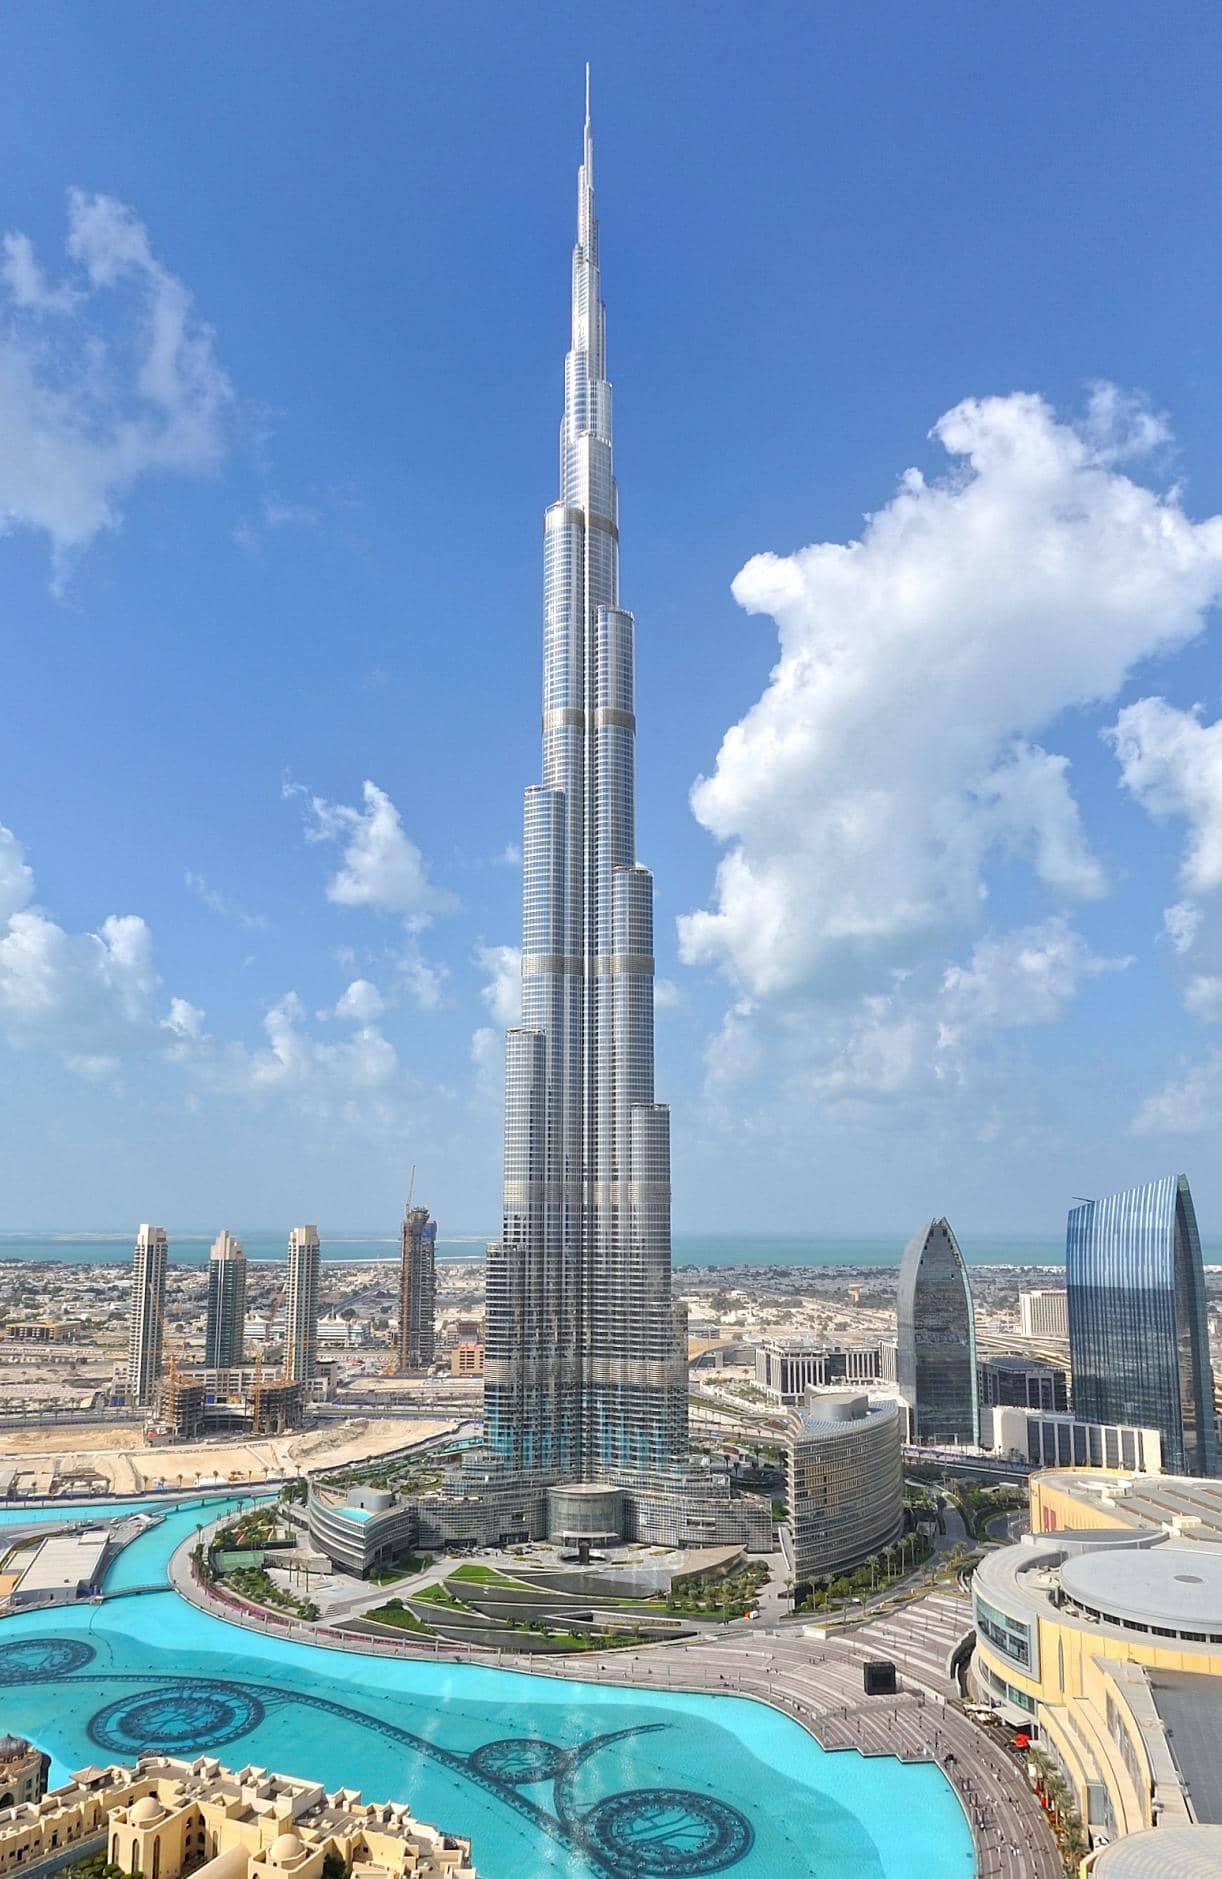 Gedung Tertinggi Di Dunia Dubai Burj Khalifa